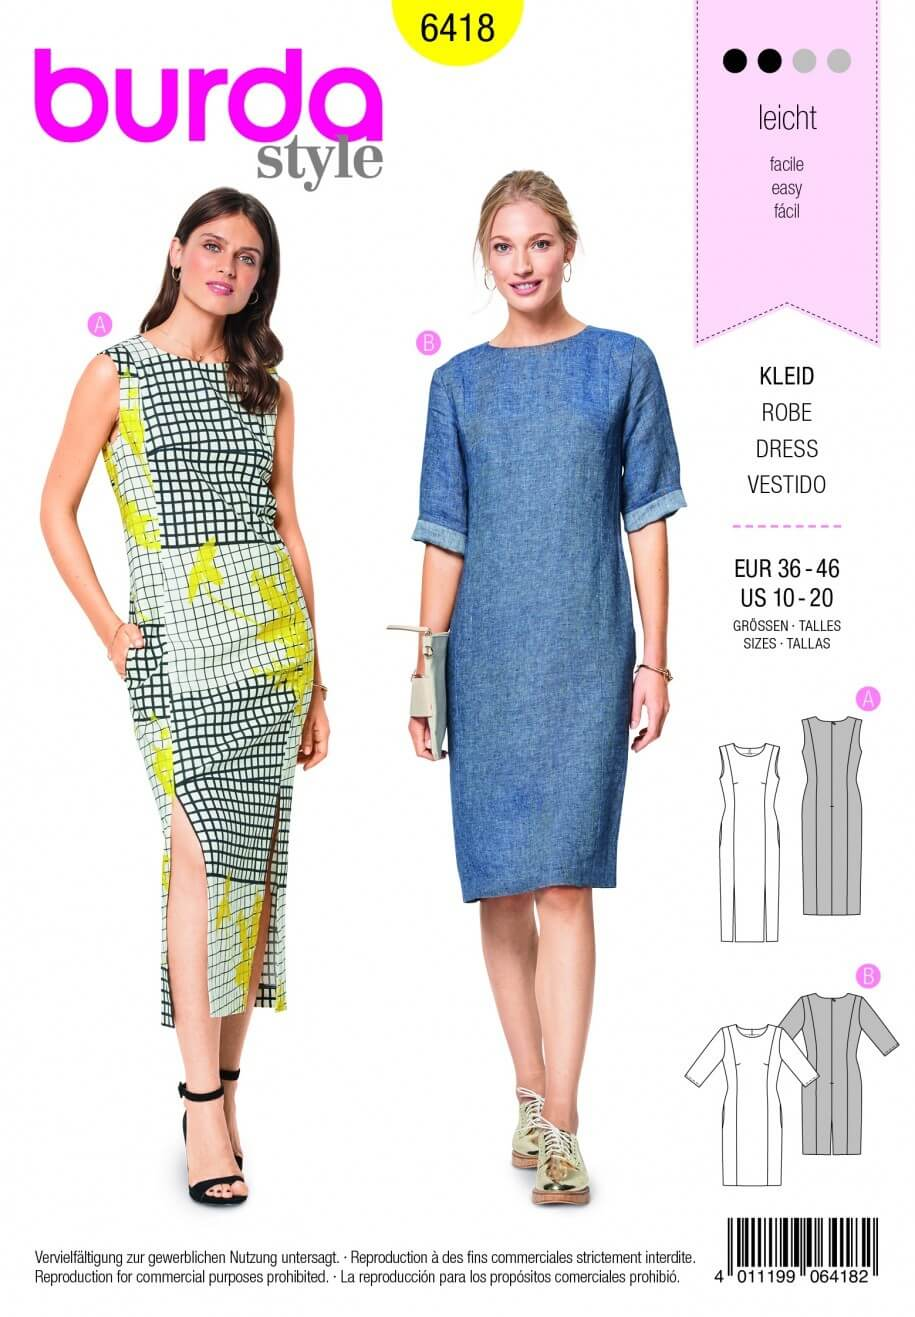 Burda Style Smart Casual Feminine Dress Fabric Sewing Pattern 6418